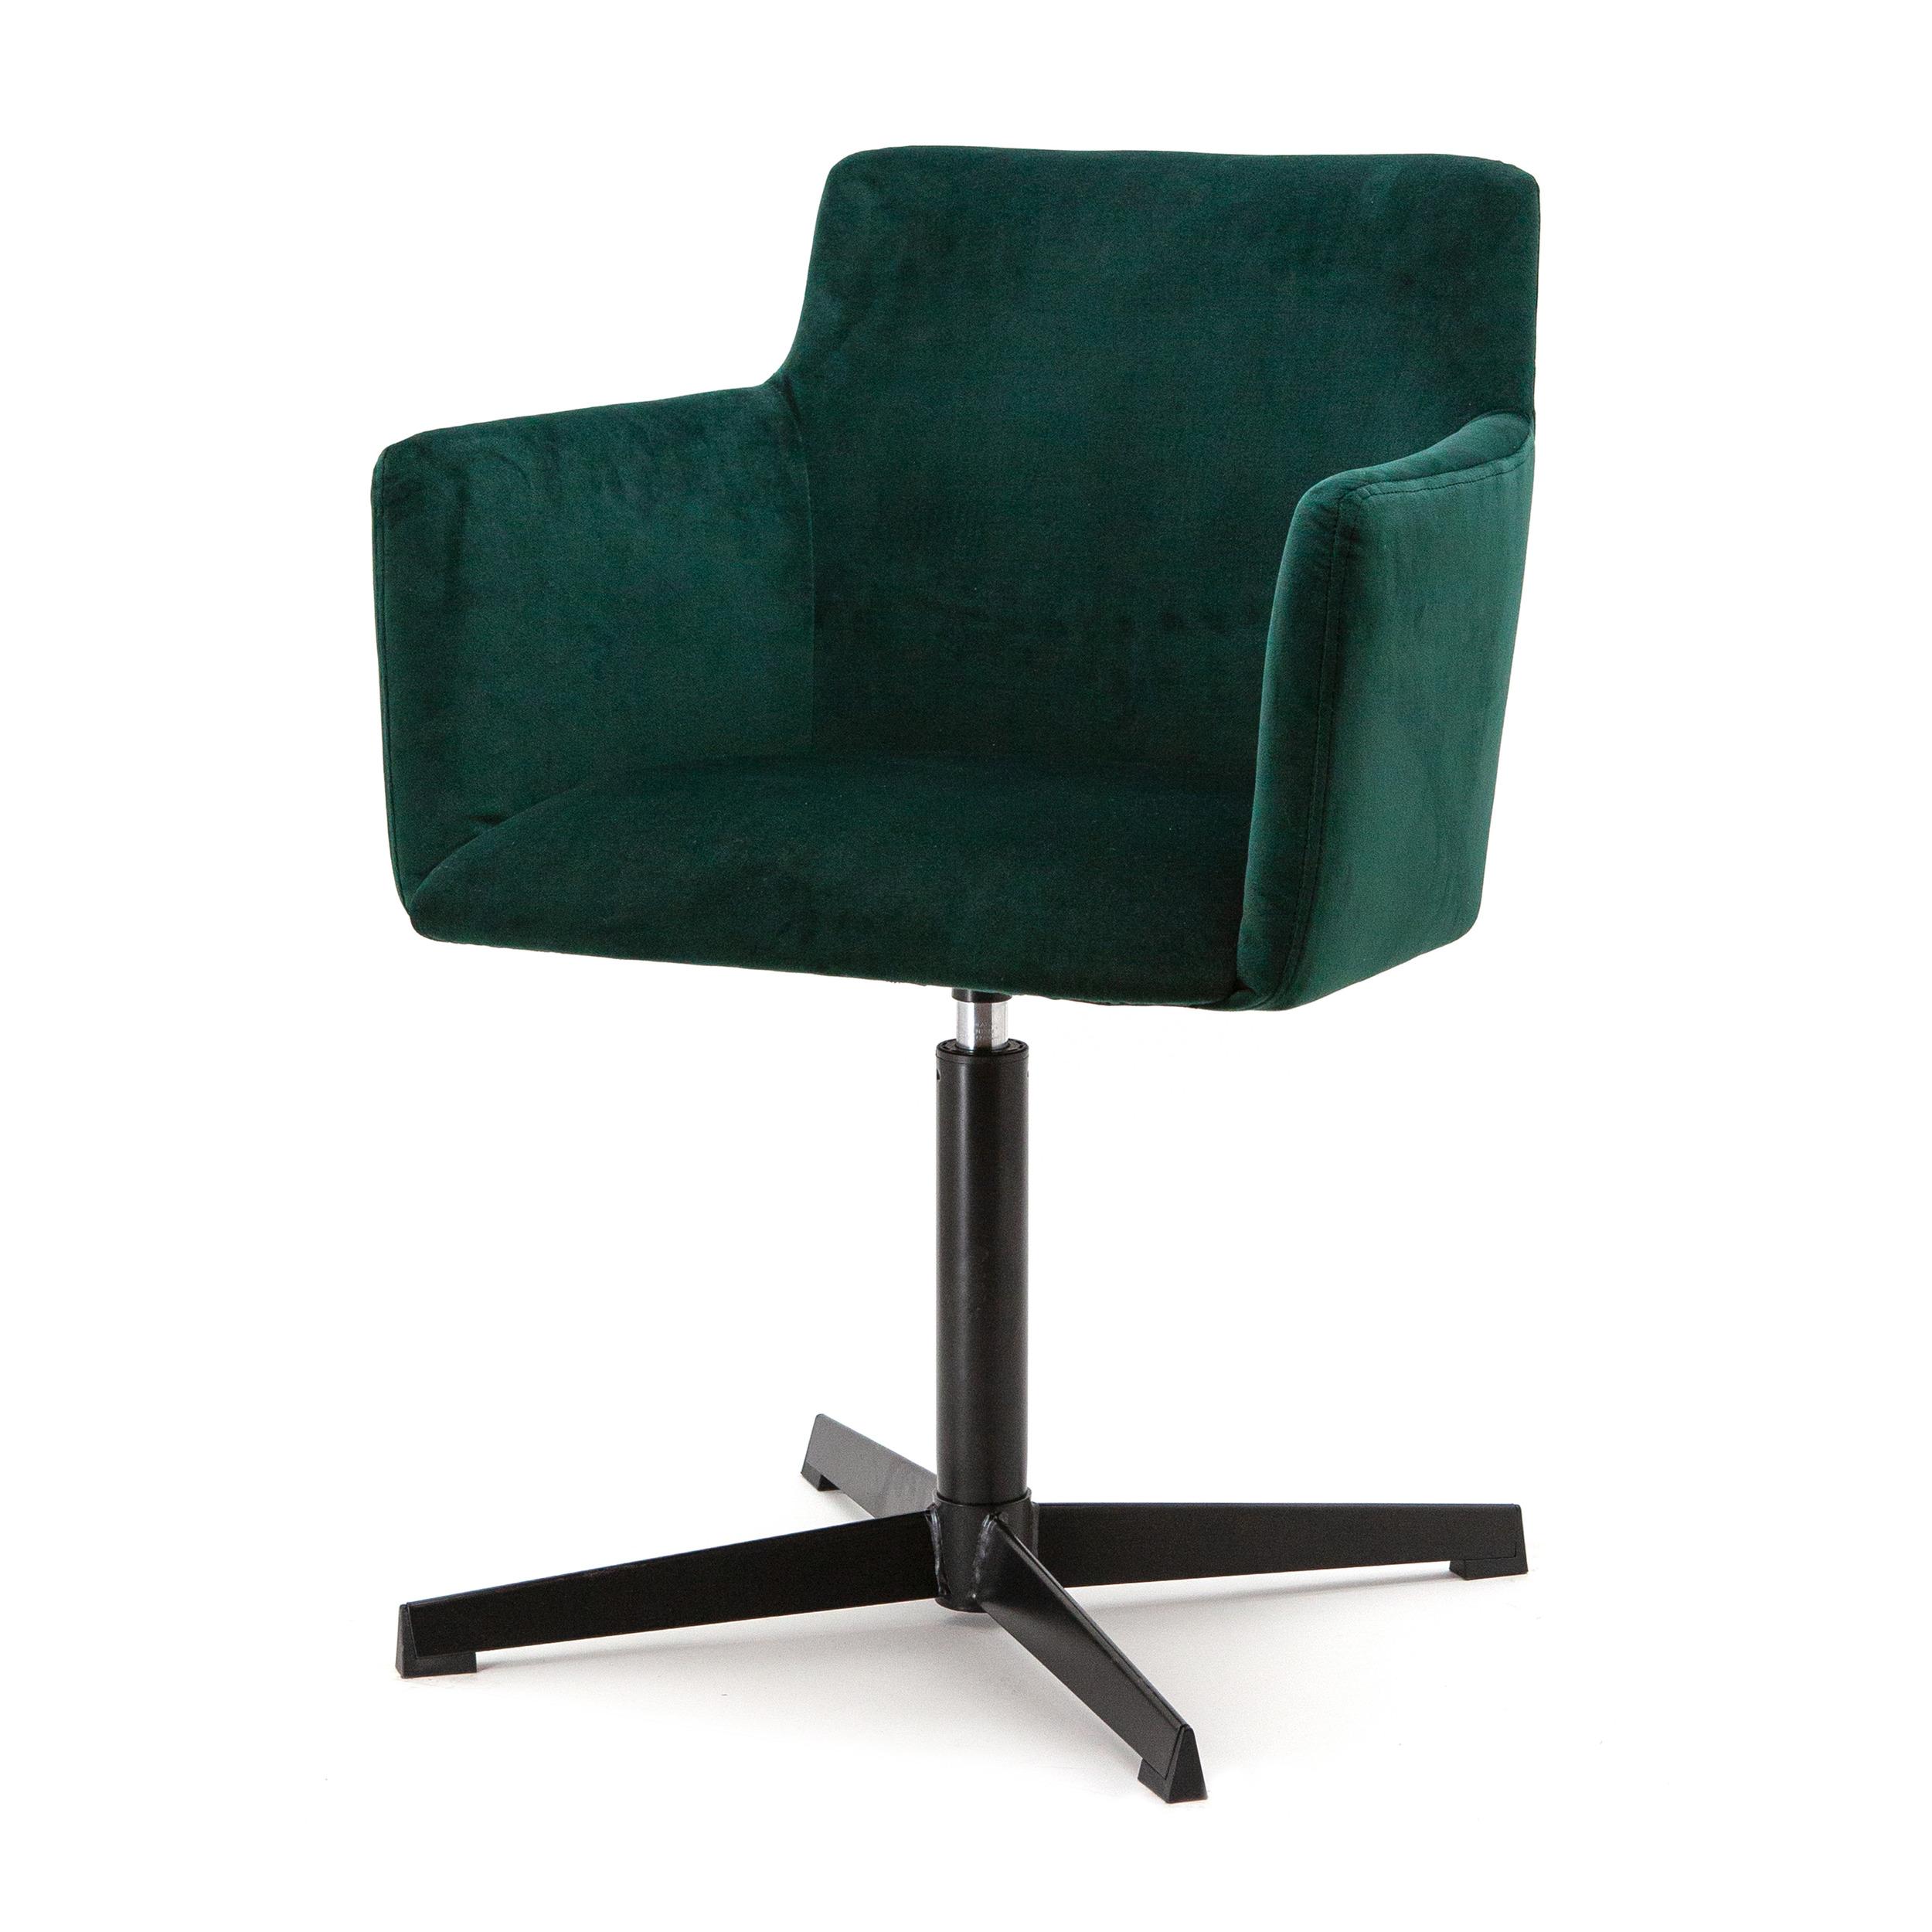 Eleonora Eetkamerstoel 'Kelvin' Velvet, kleur groen